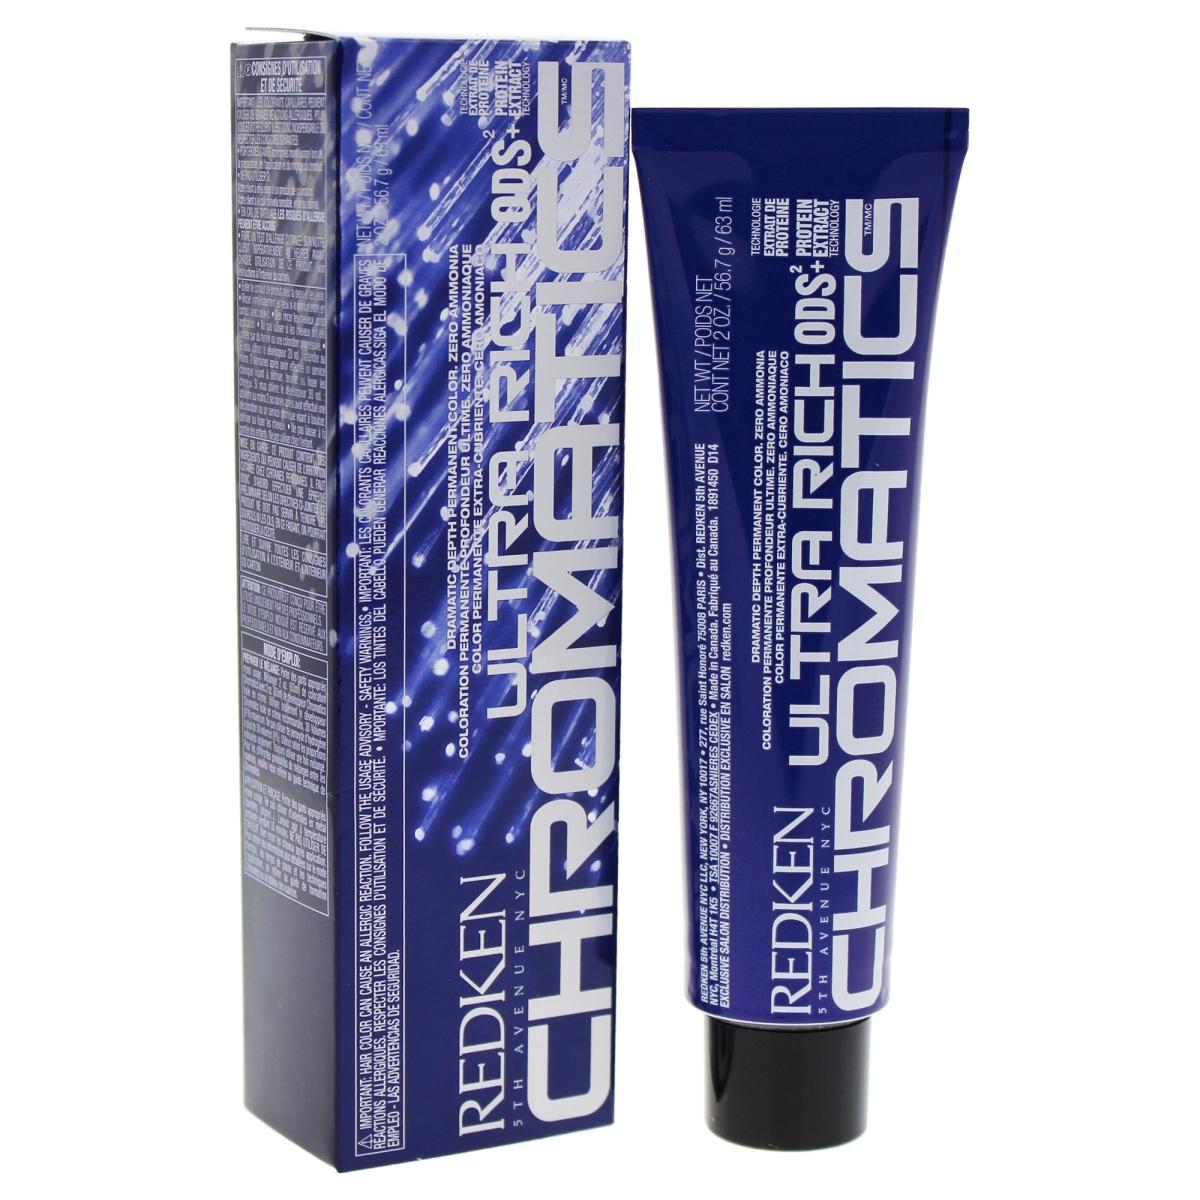 Redken U-HC-11833 2 oz Chromatics Ultra Rich Hair Color for Unisex - 9GI Gold & Iridescent